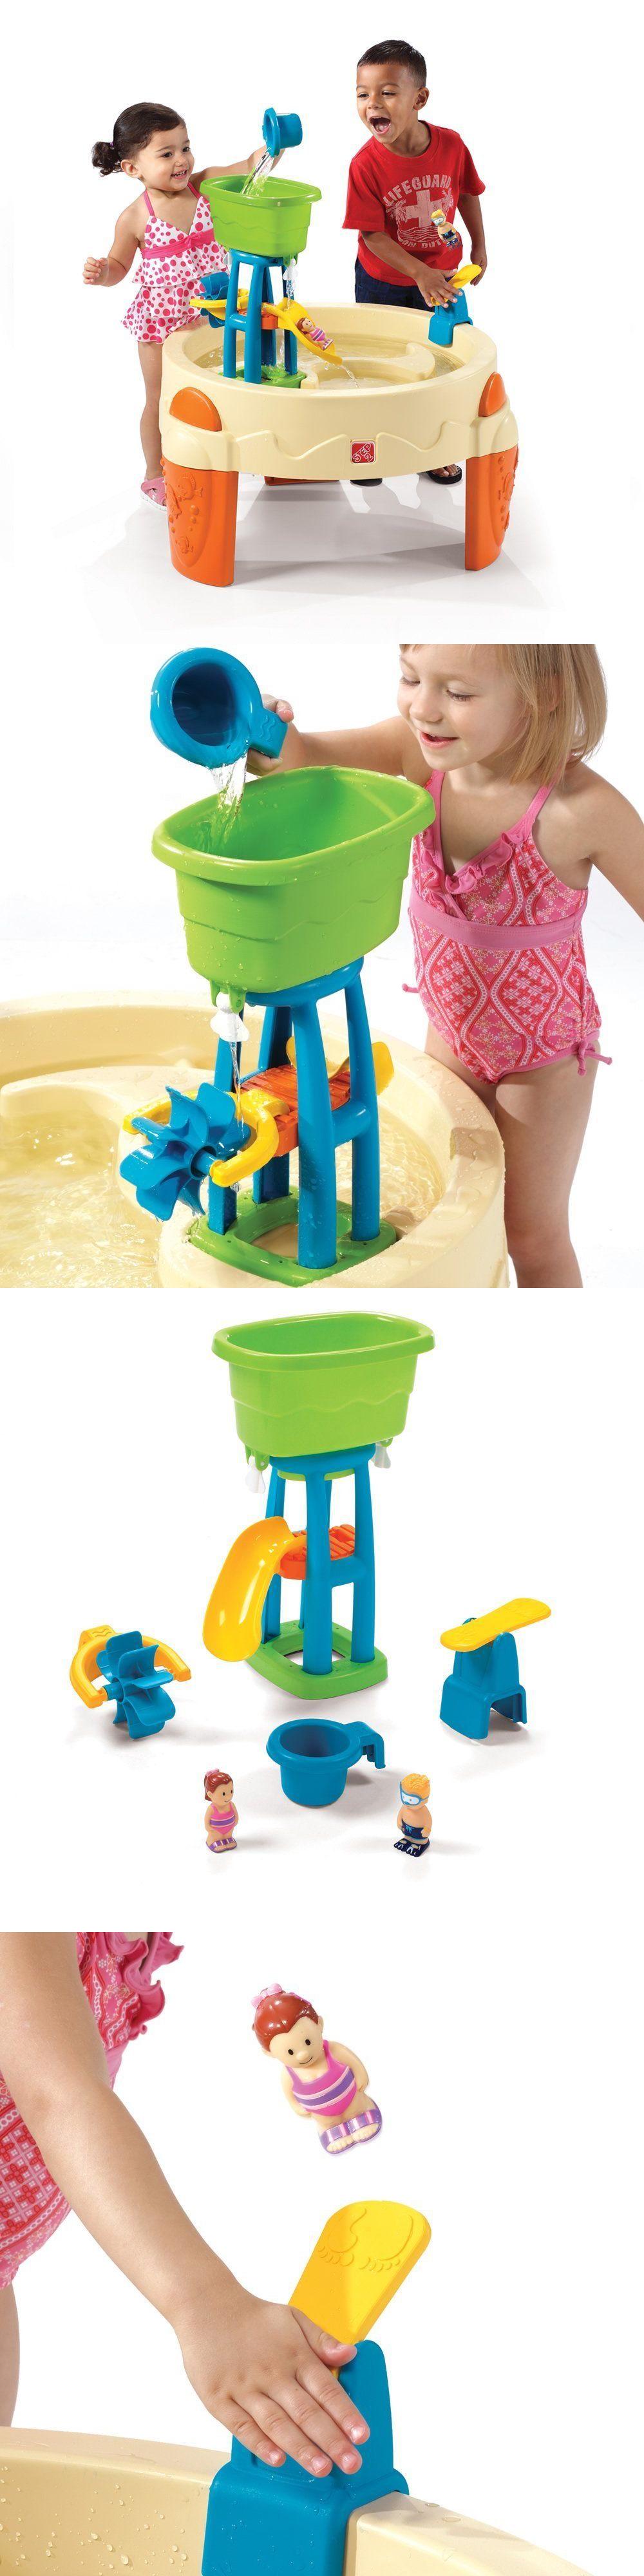 Water Toys Step2 Toddler Big Splash Waterpark Water Play